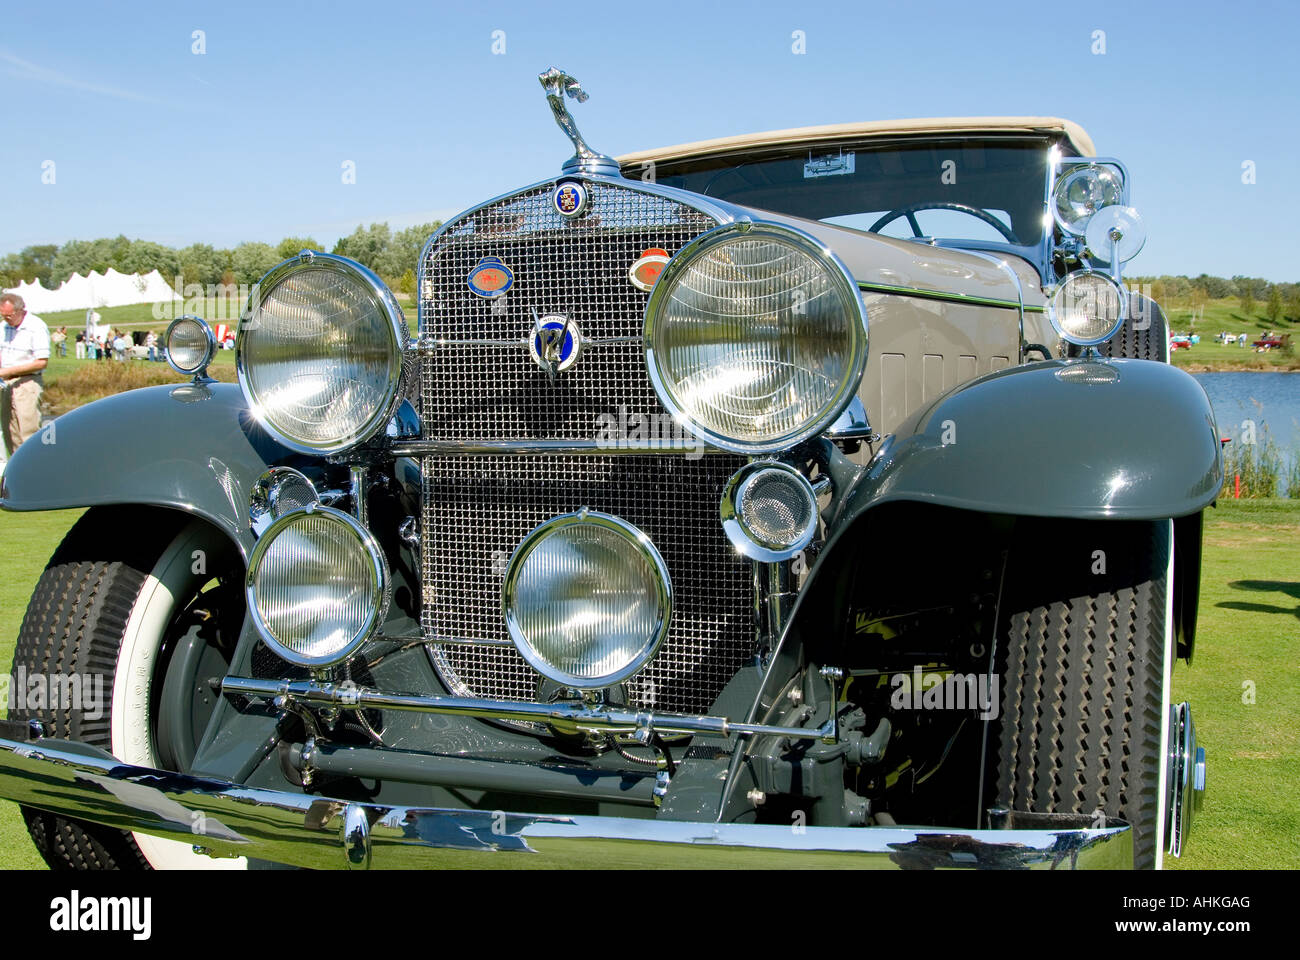 1931 Cadillac 370-A - Stock Image